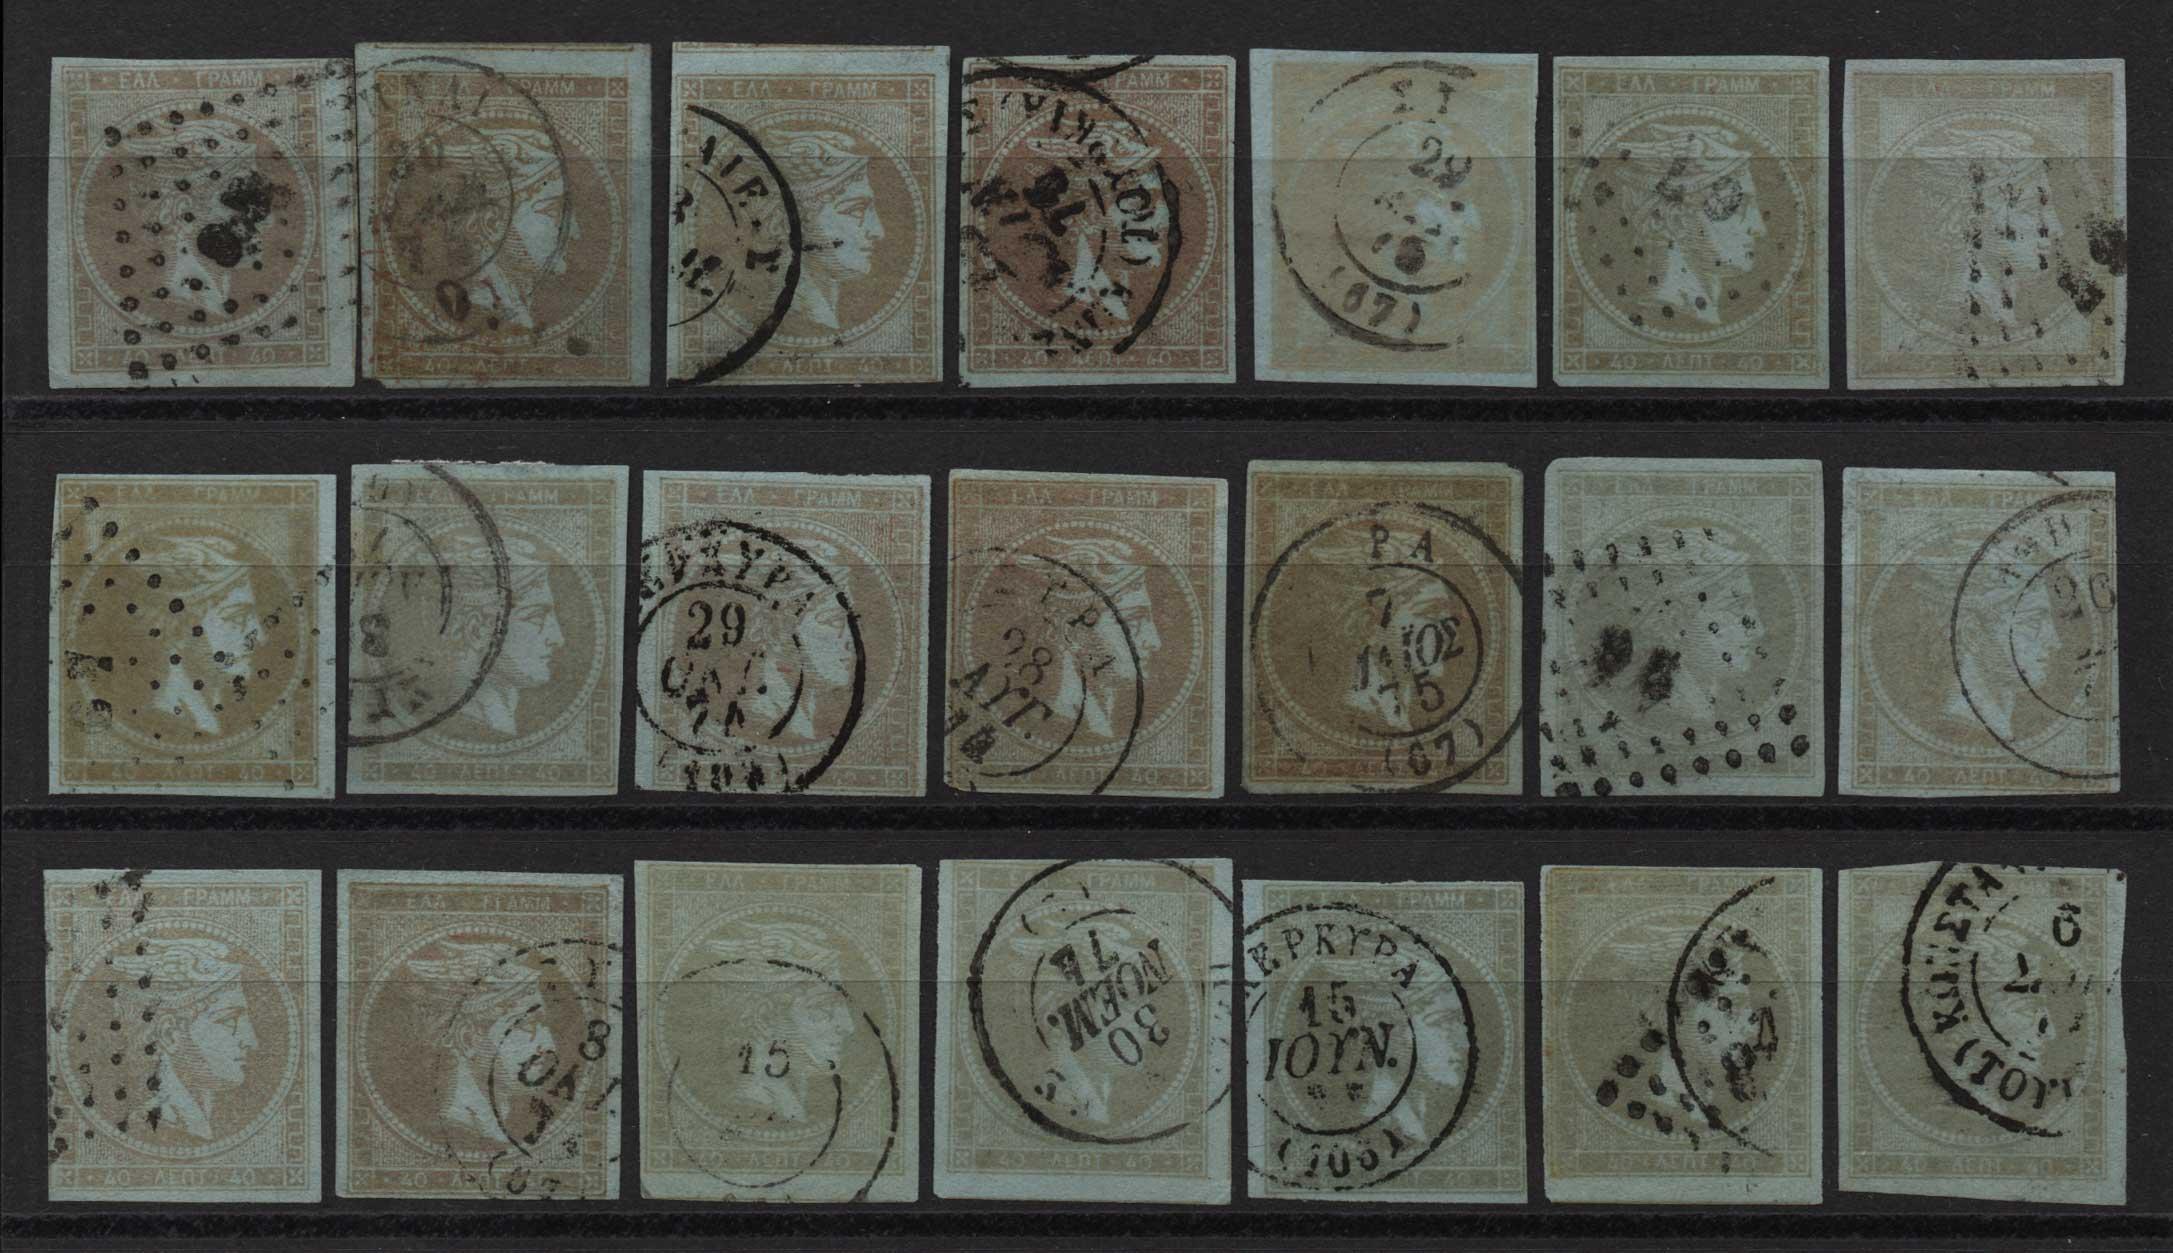 Lot 14 - -  LARGE HERMES HEAD large hermes head -  Athens Auctions Public Auction 70 General Stamp Sale